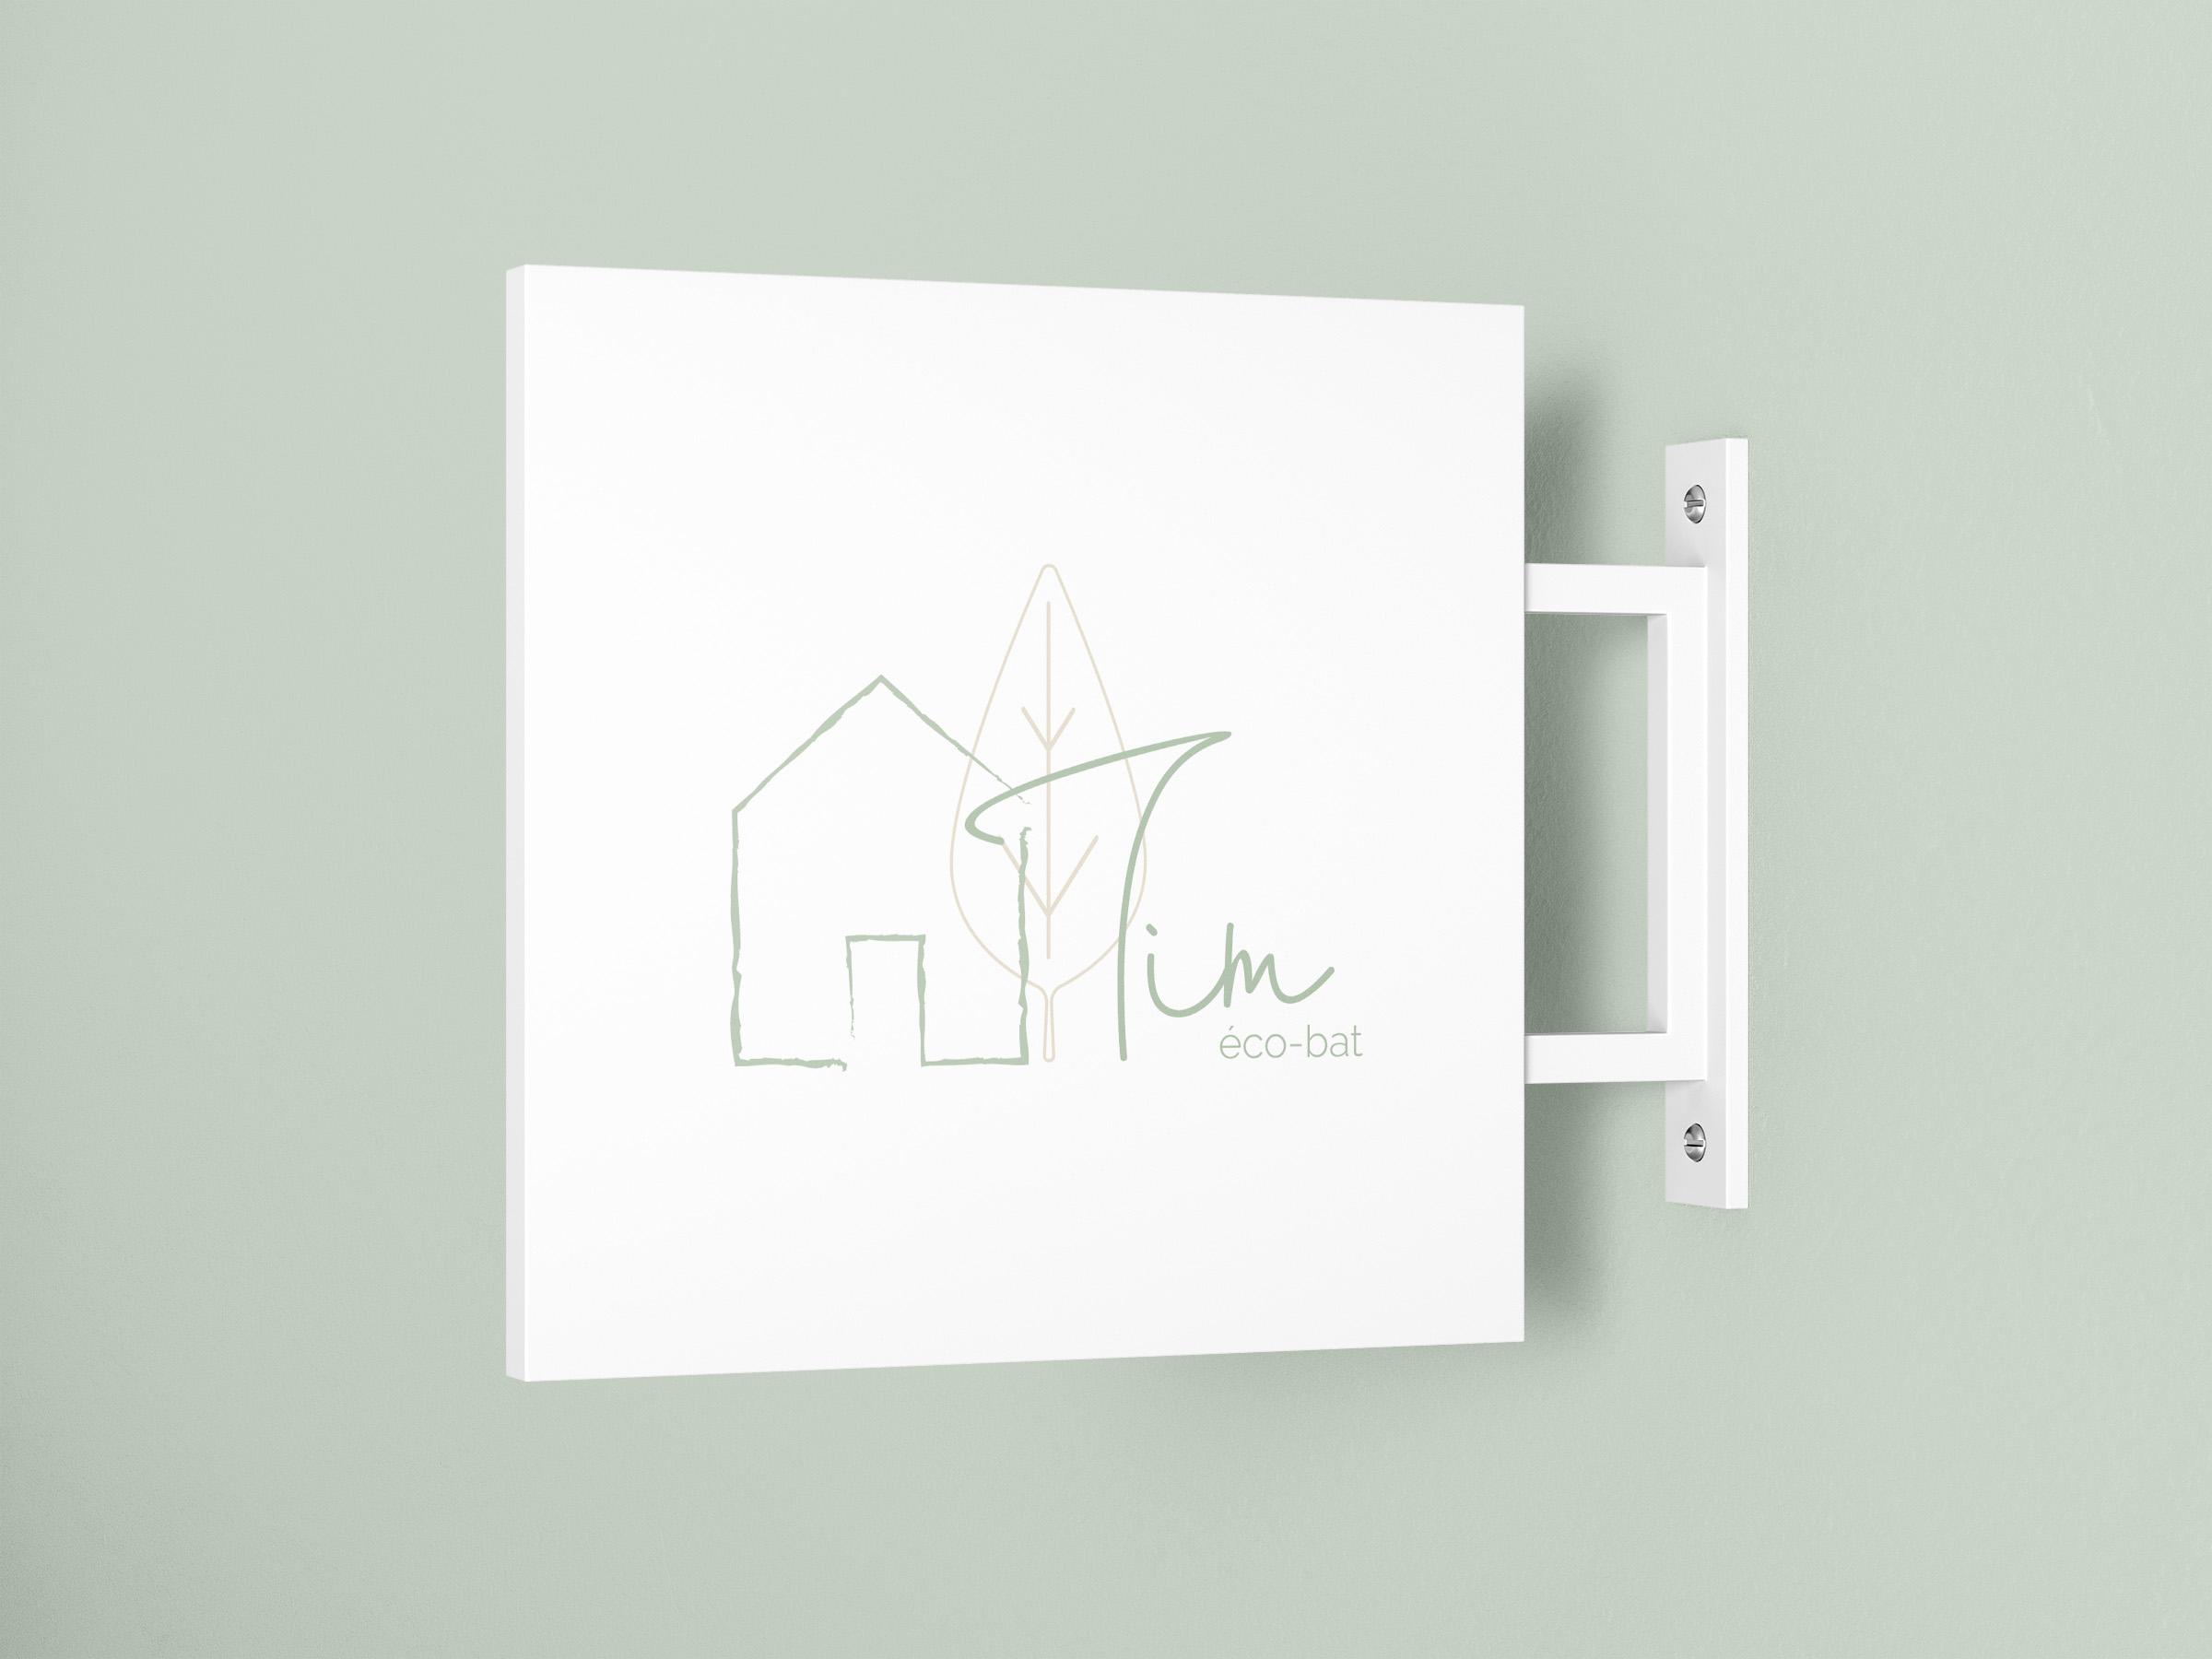 Tim Eco-bat mise en scene logo